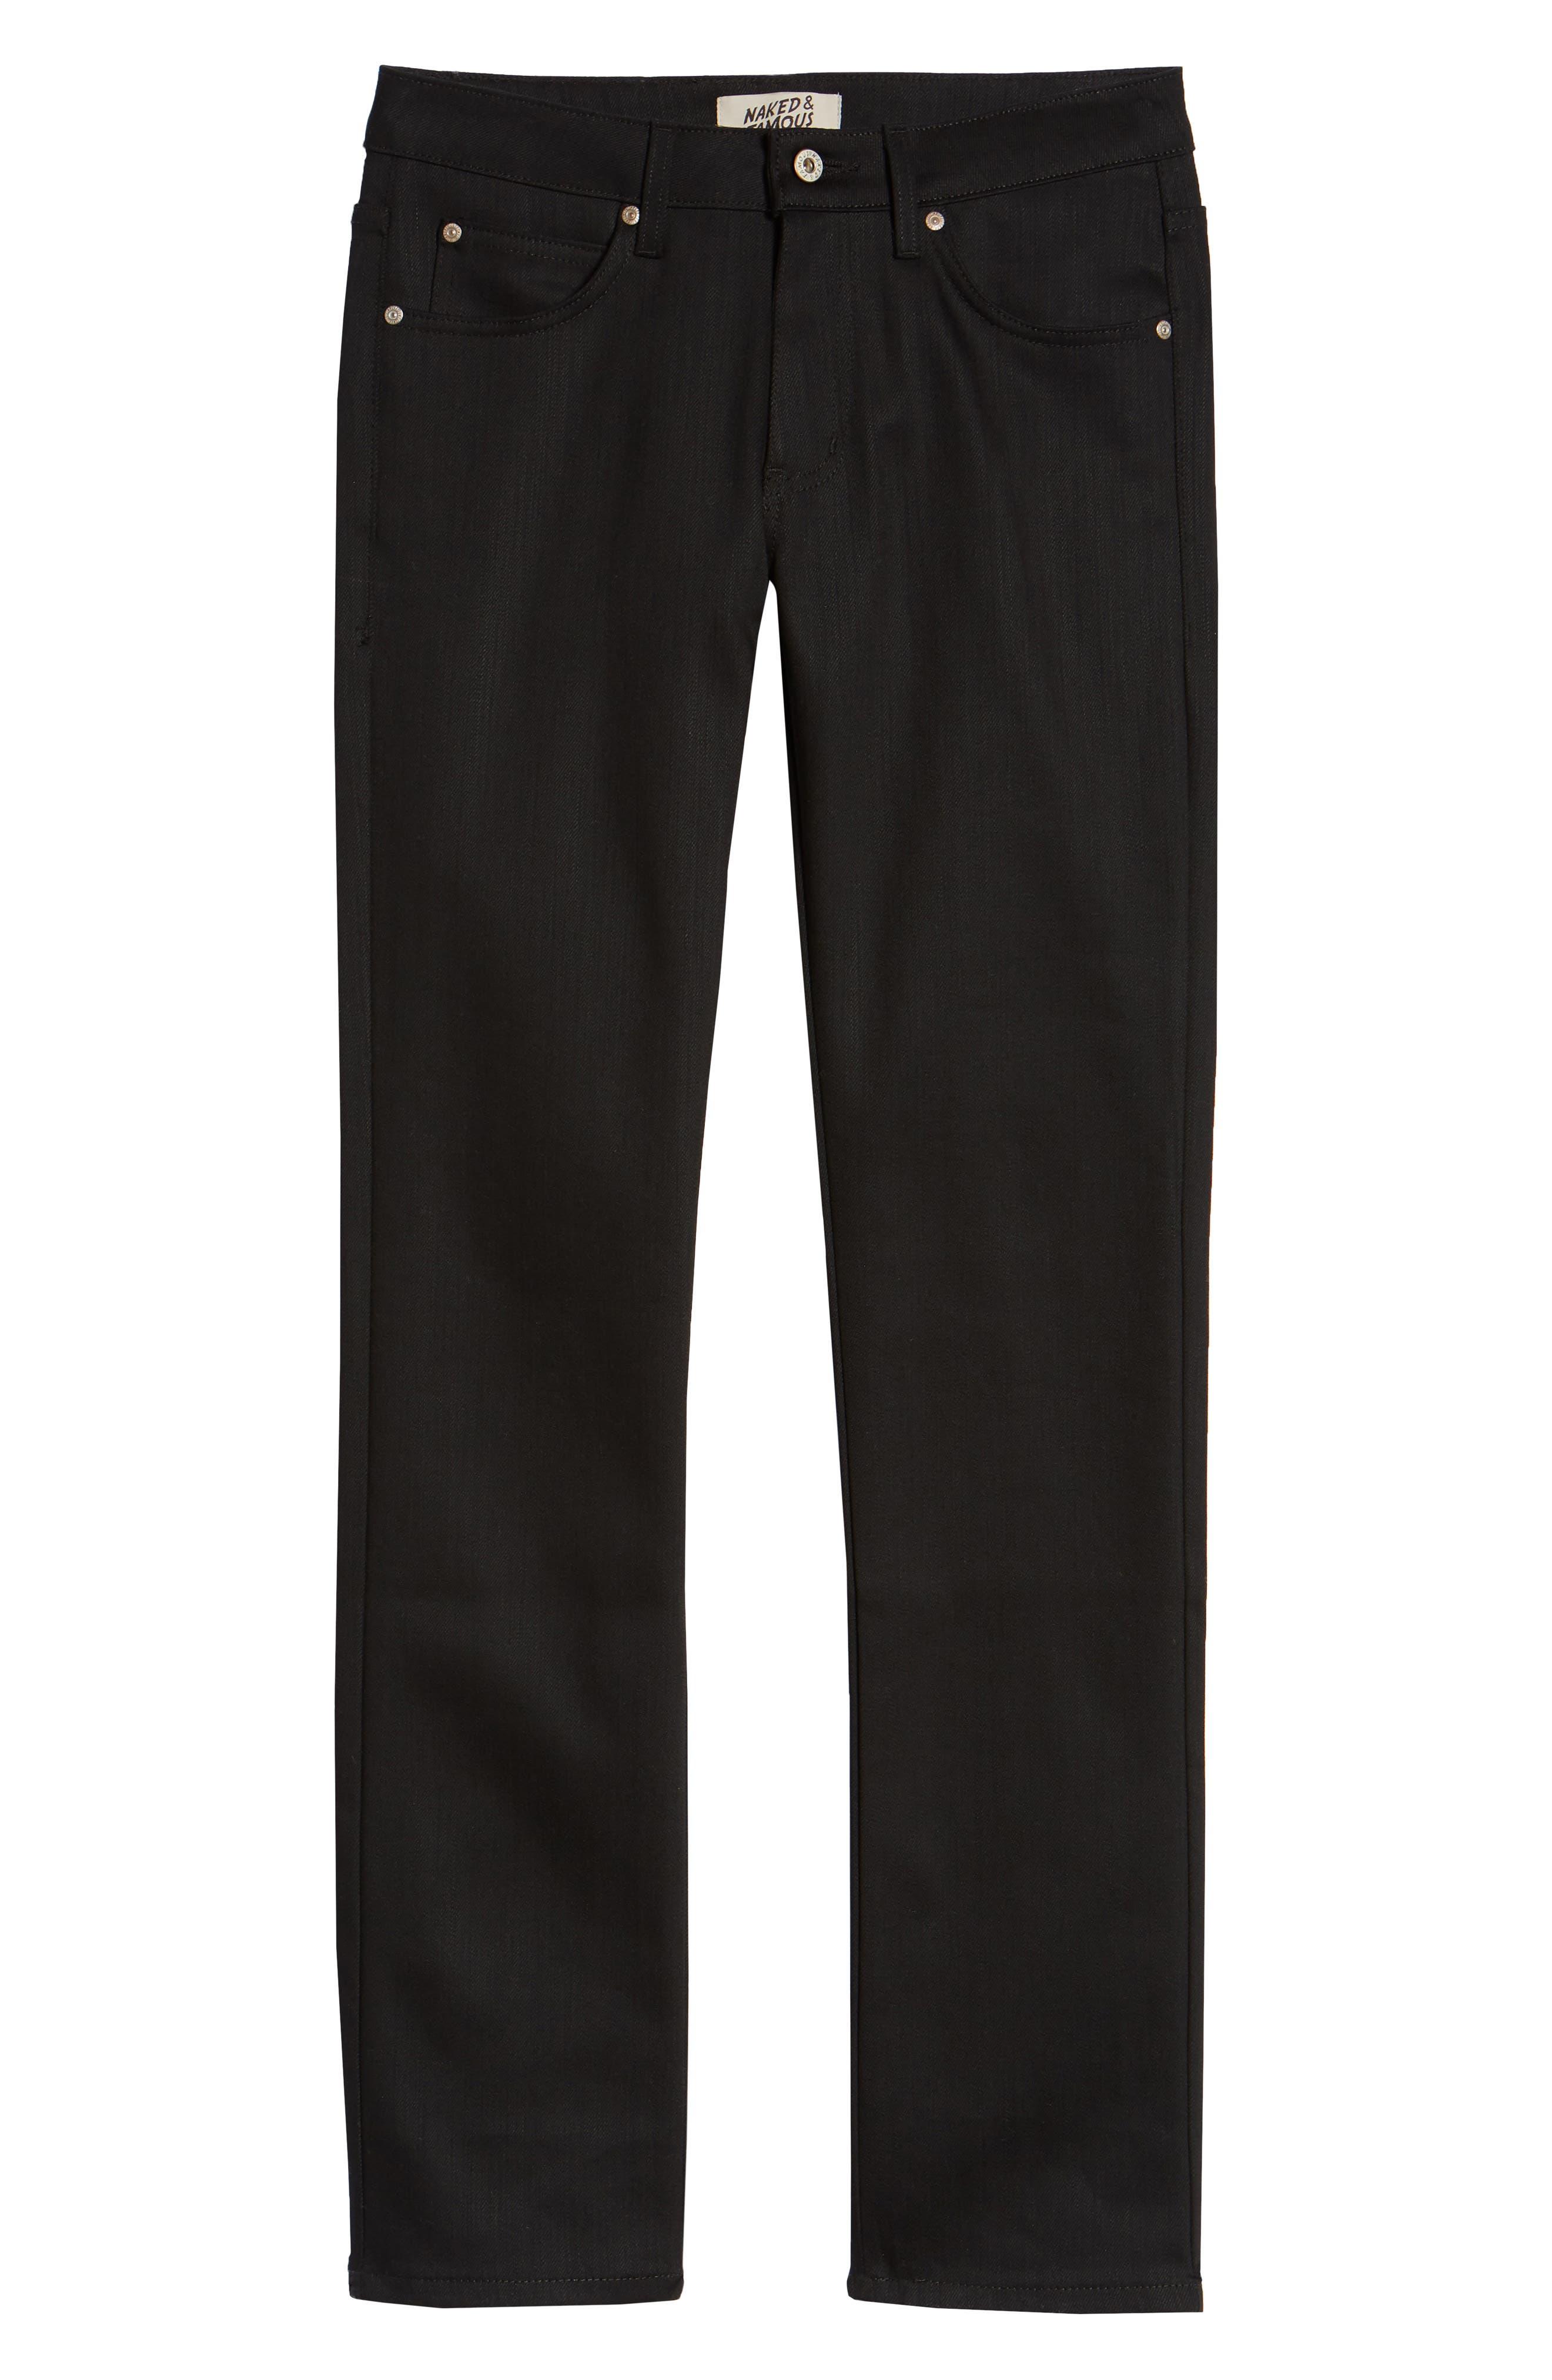 Skinny Guy Skinny Fit Jeans,                             Alternate thumbnail 2, color,                             BLACK POWER STRETCH